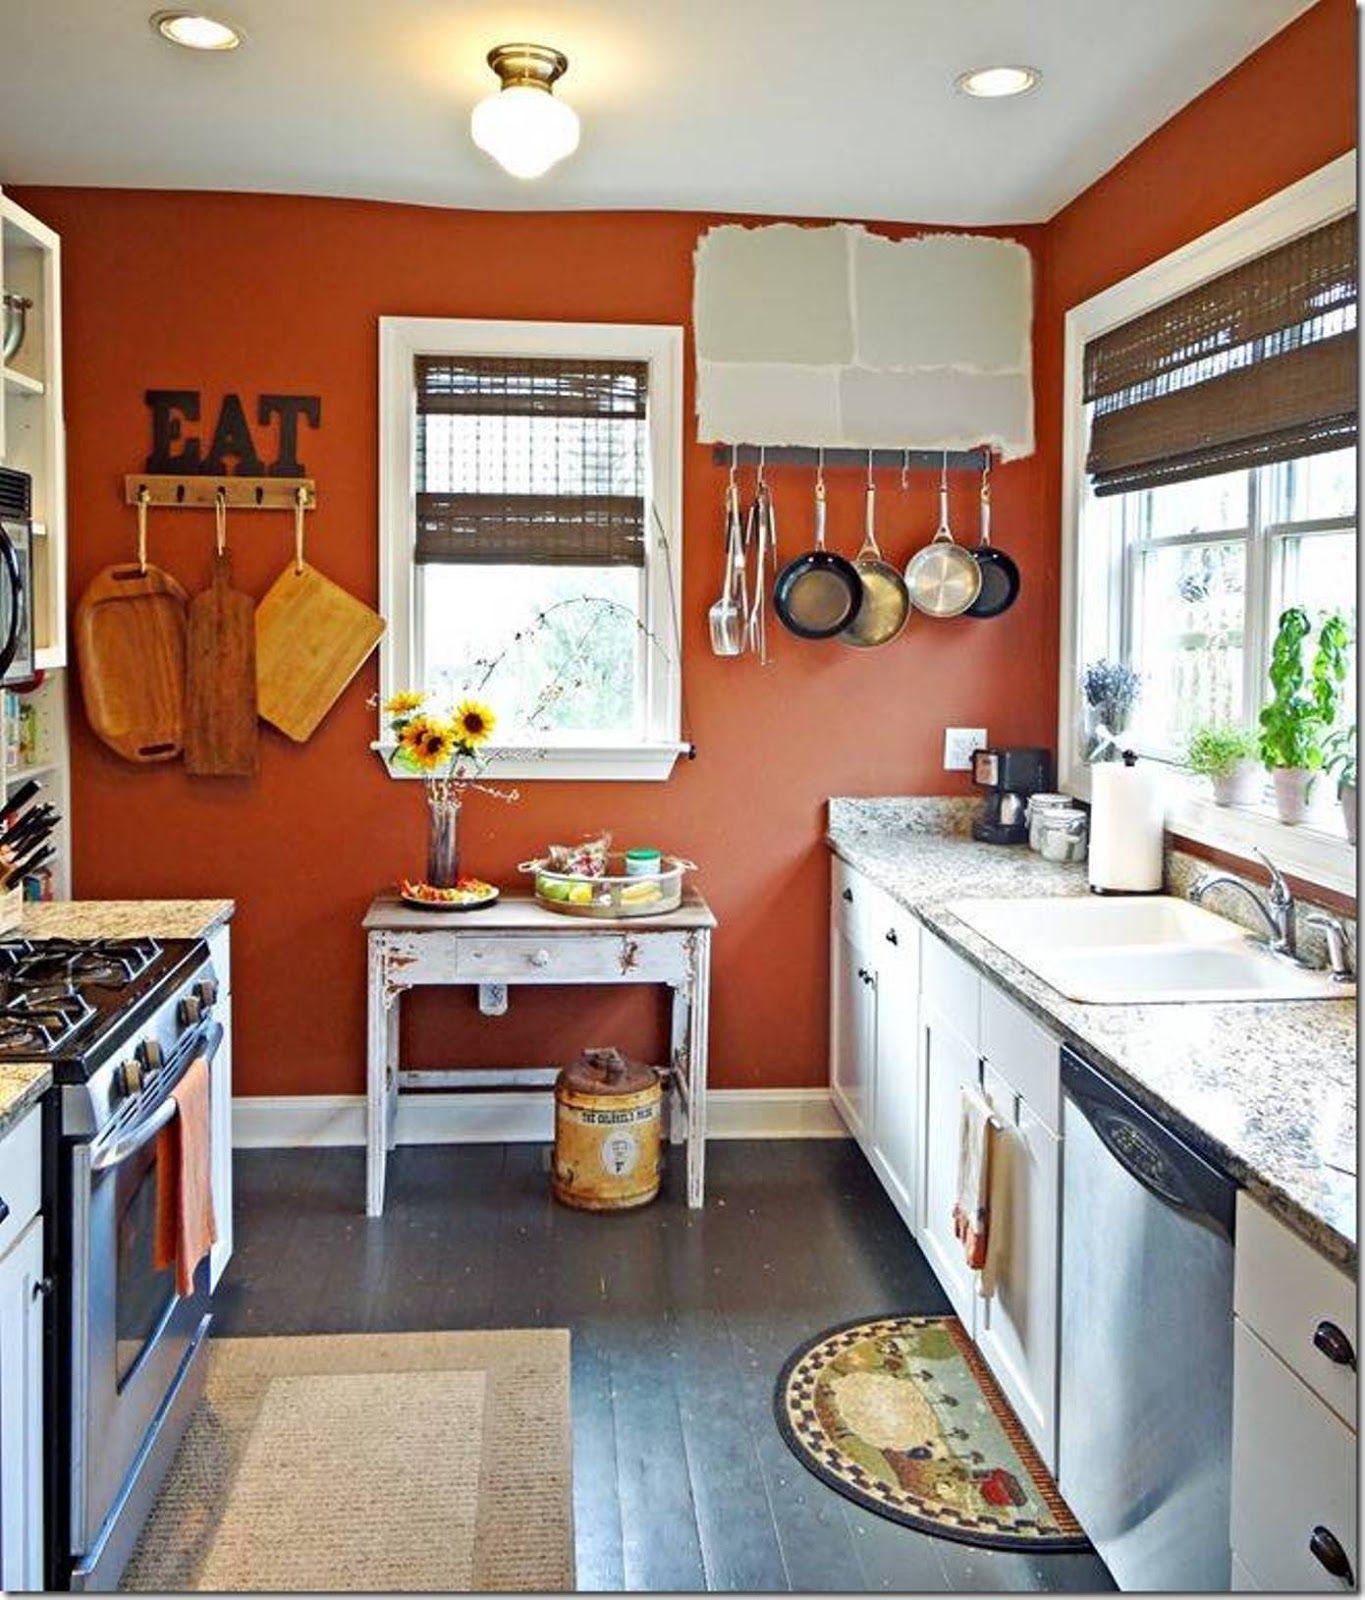 110 burnt orange kitchen decor ideas burnt orange kitchen decor rh pinterest com